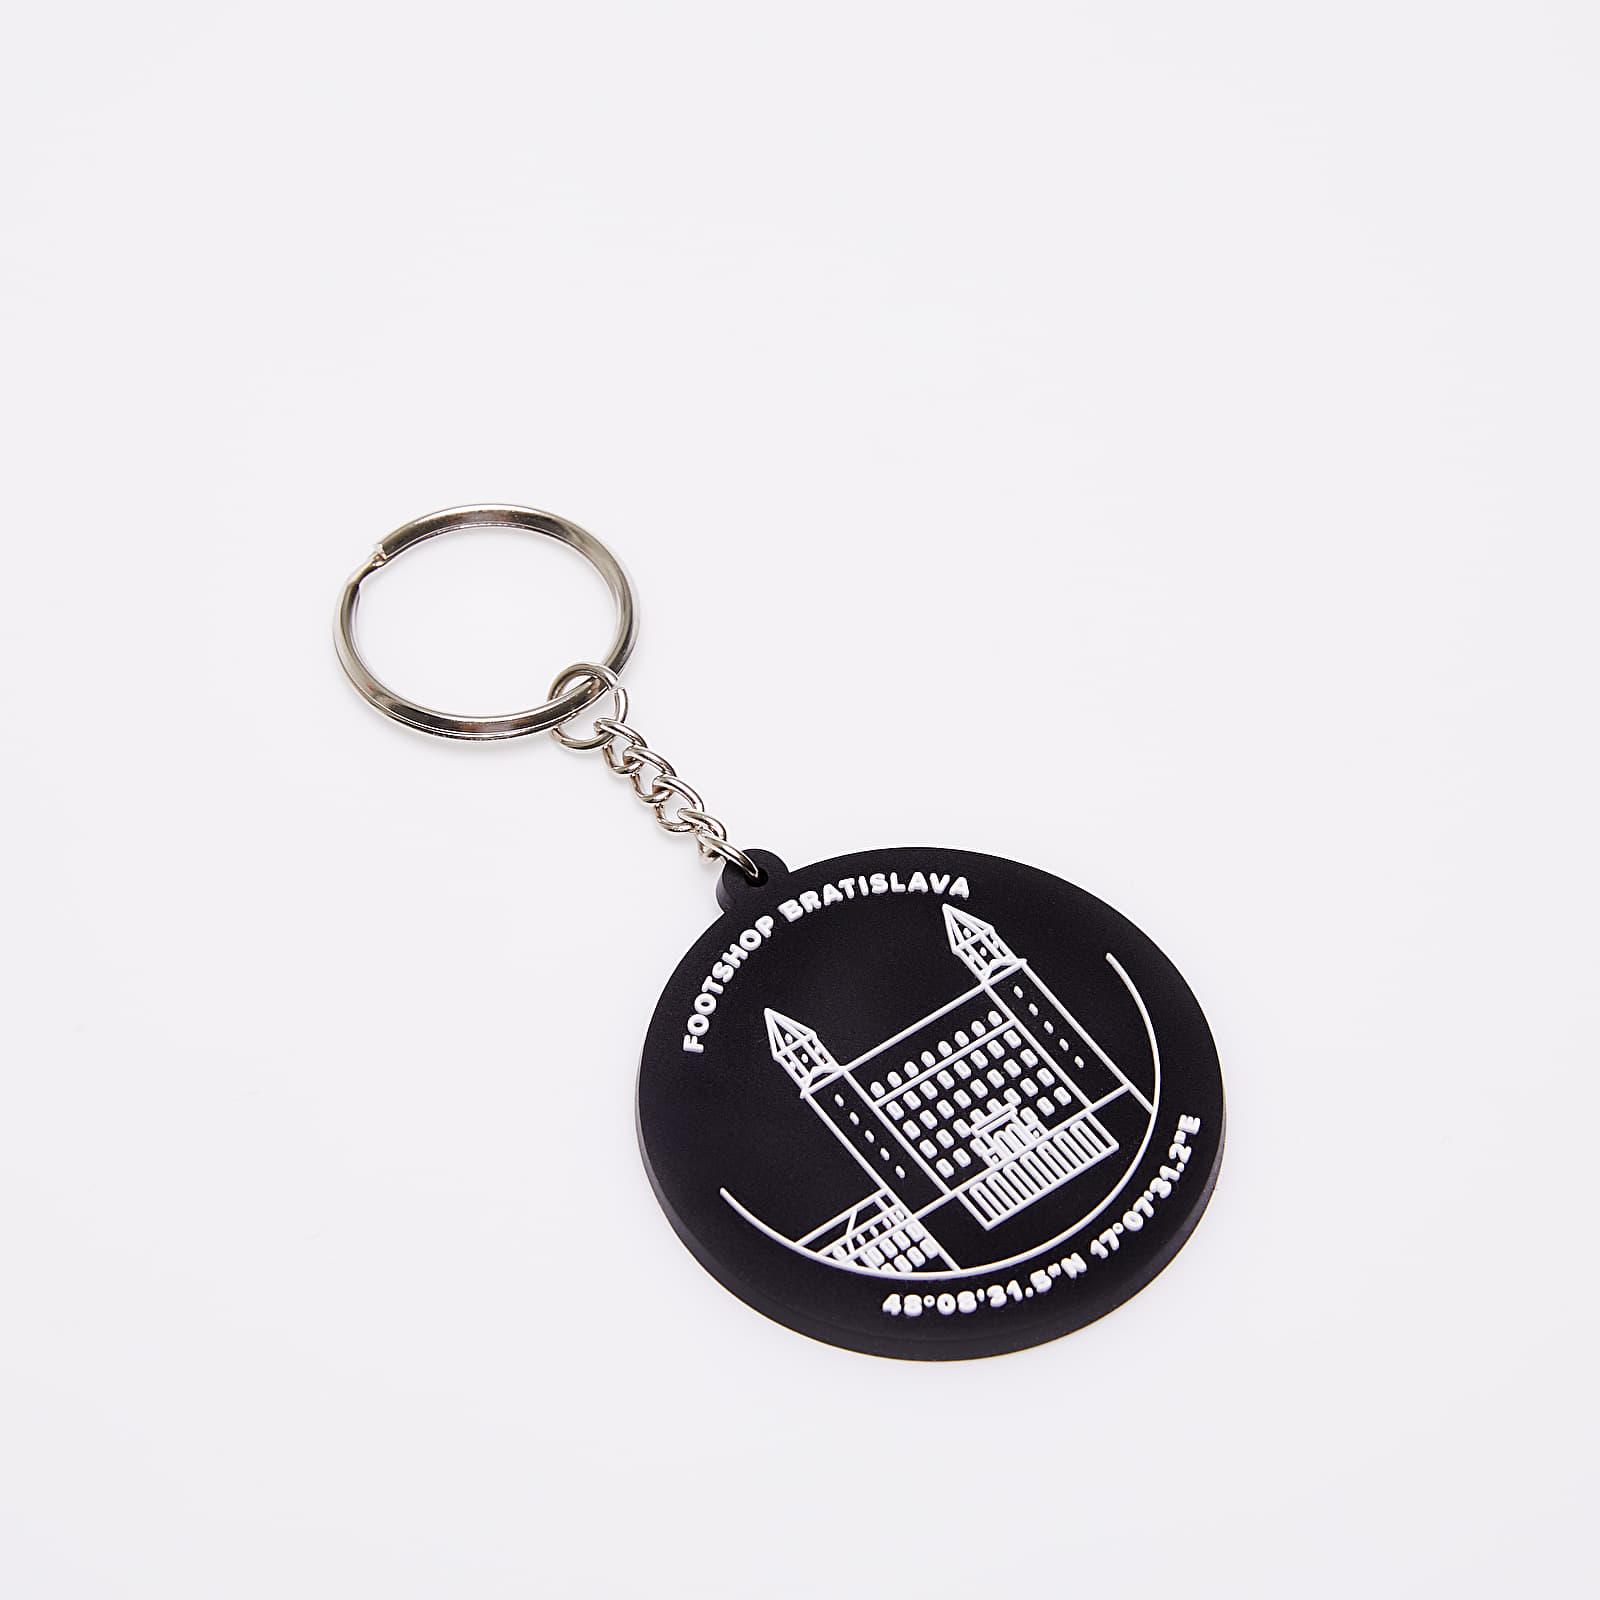 Dodatki Footshop Bratislava Keychain Black